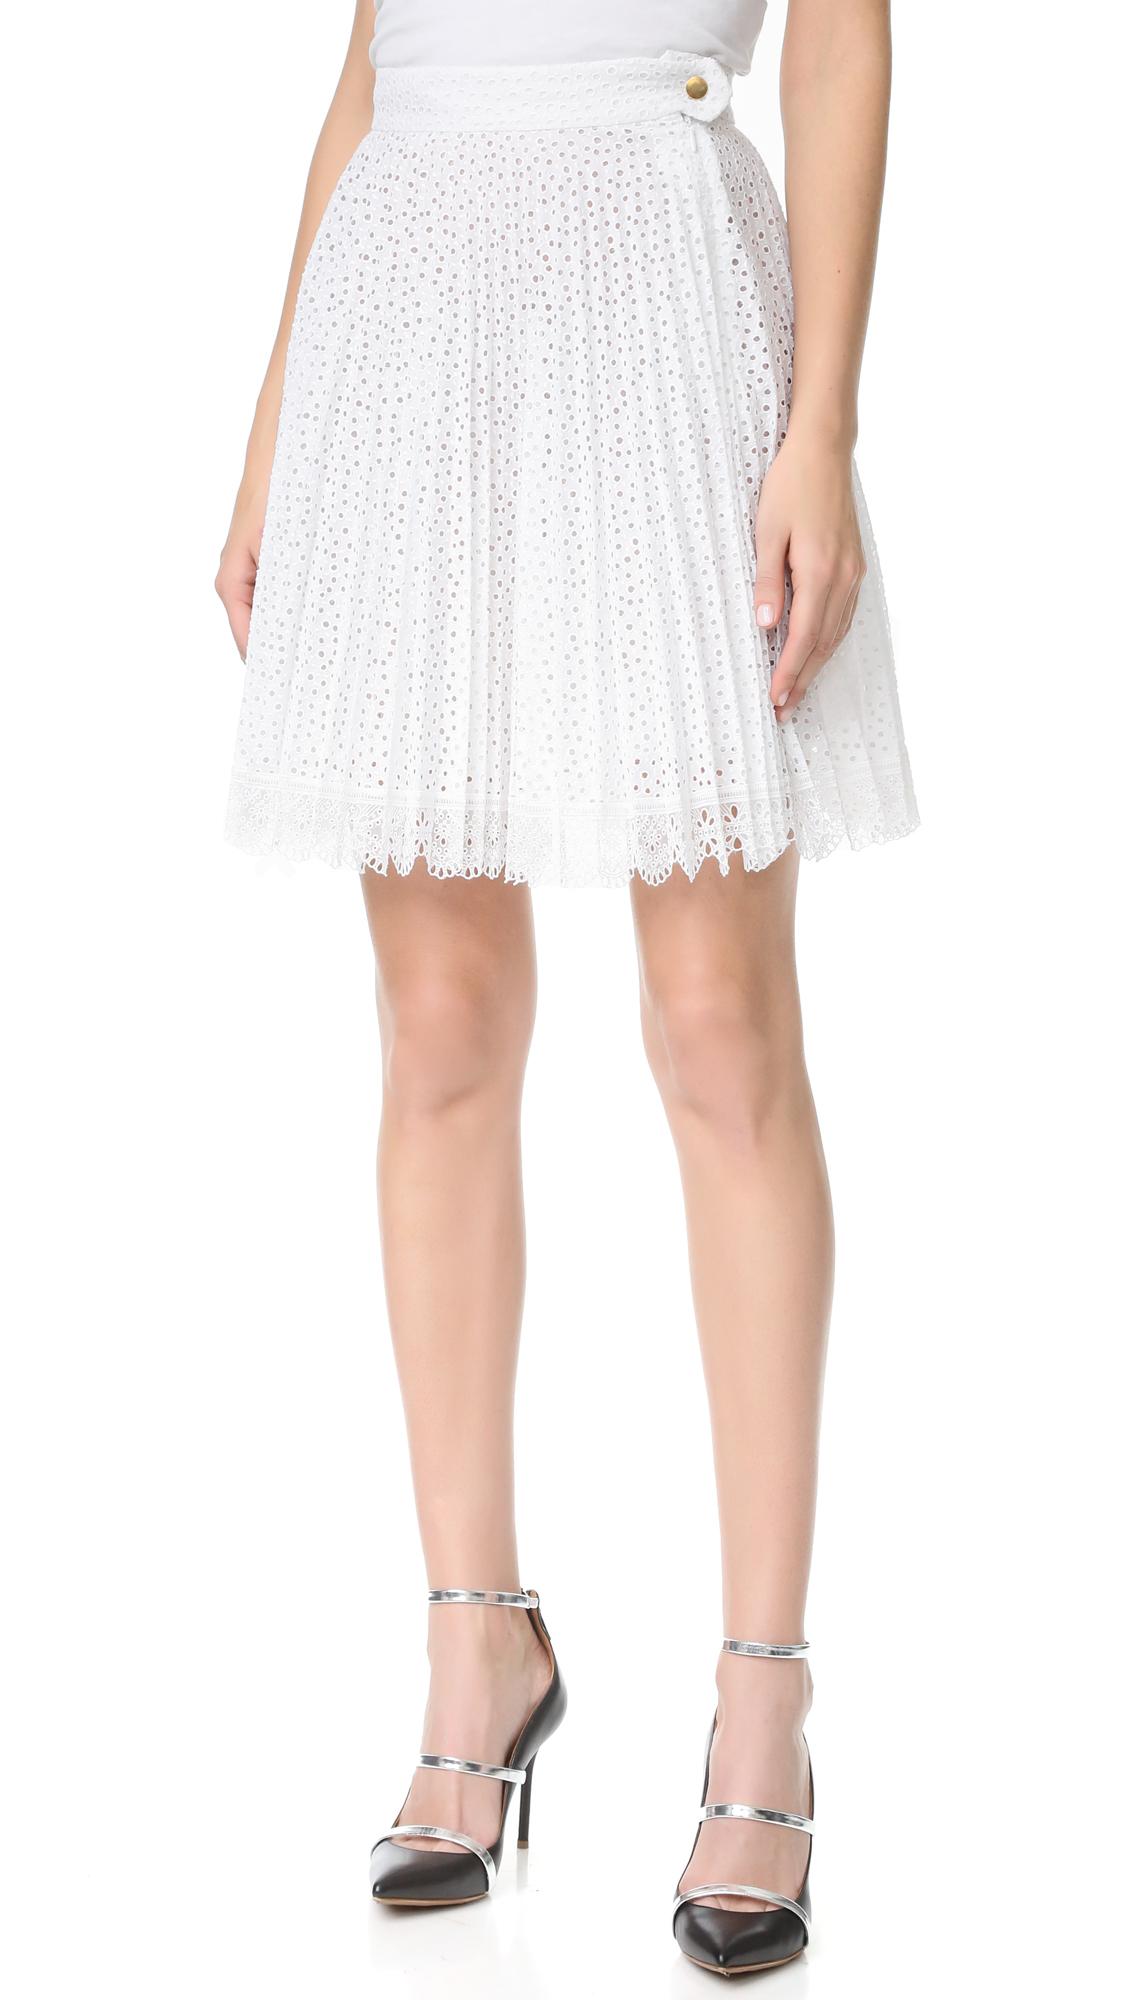 Antonio Berardi Pleated Skirt - Bianco Ottico at Shopbop